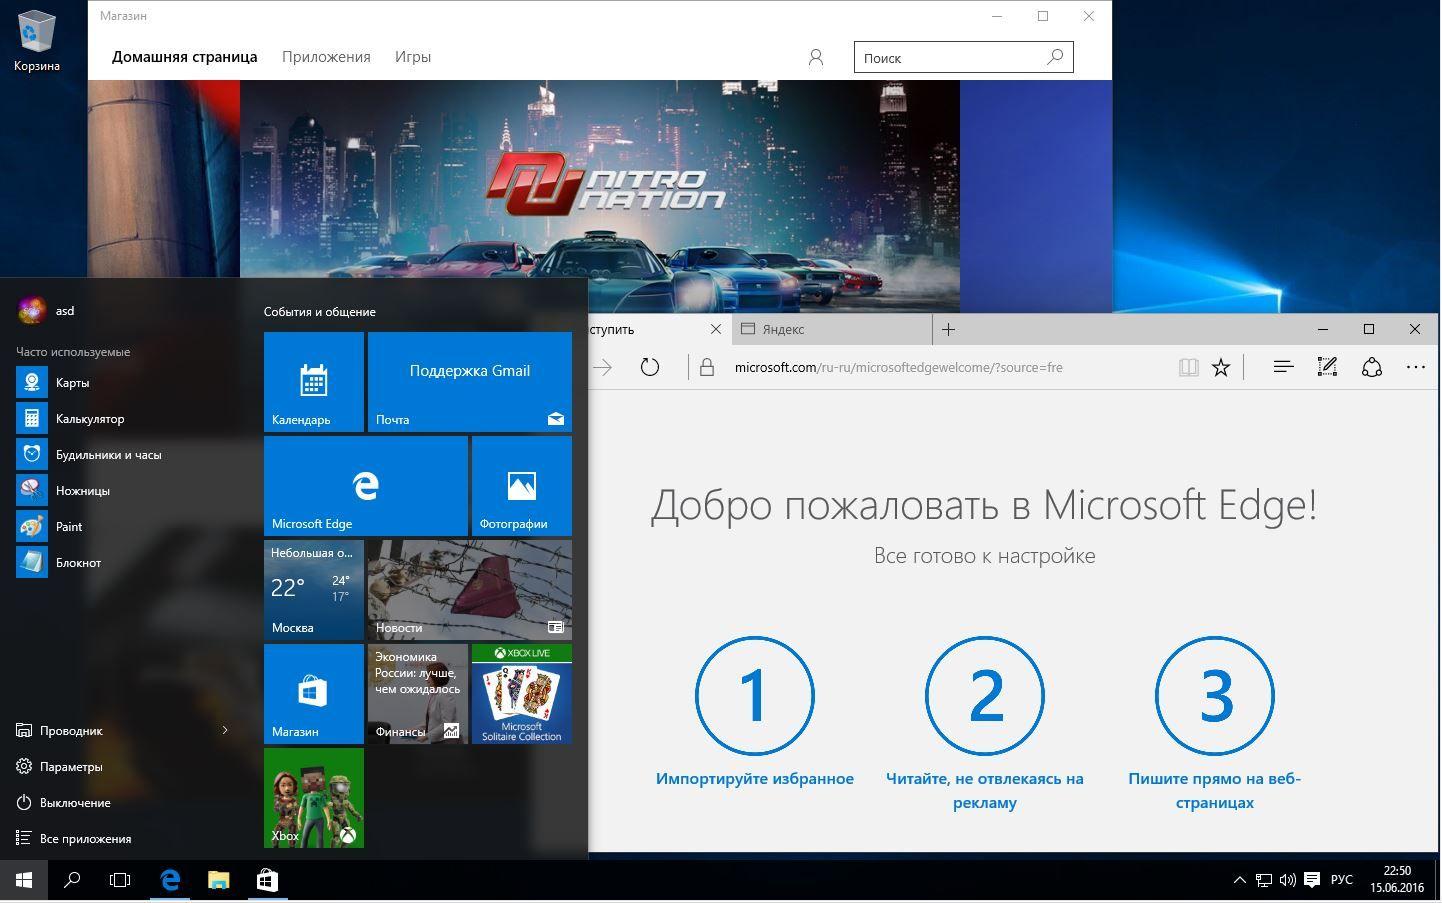 Microsoft Windows 10 TH2 RTM 10586.0.TH2_RELEASE.151029 ...